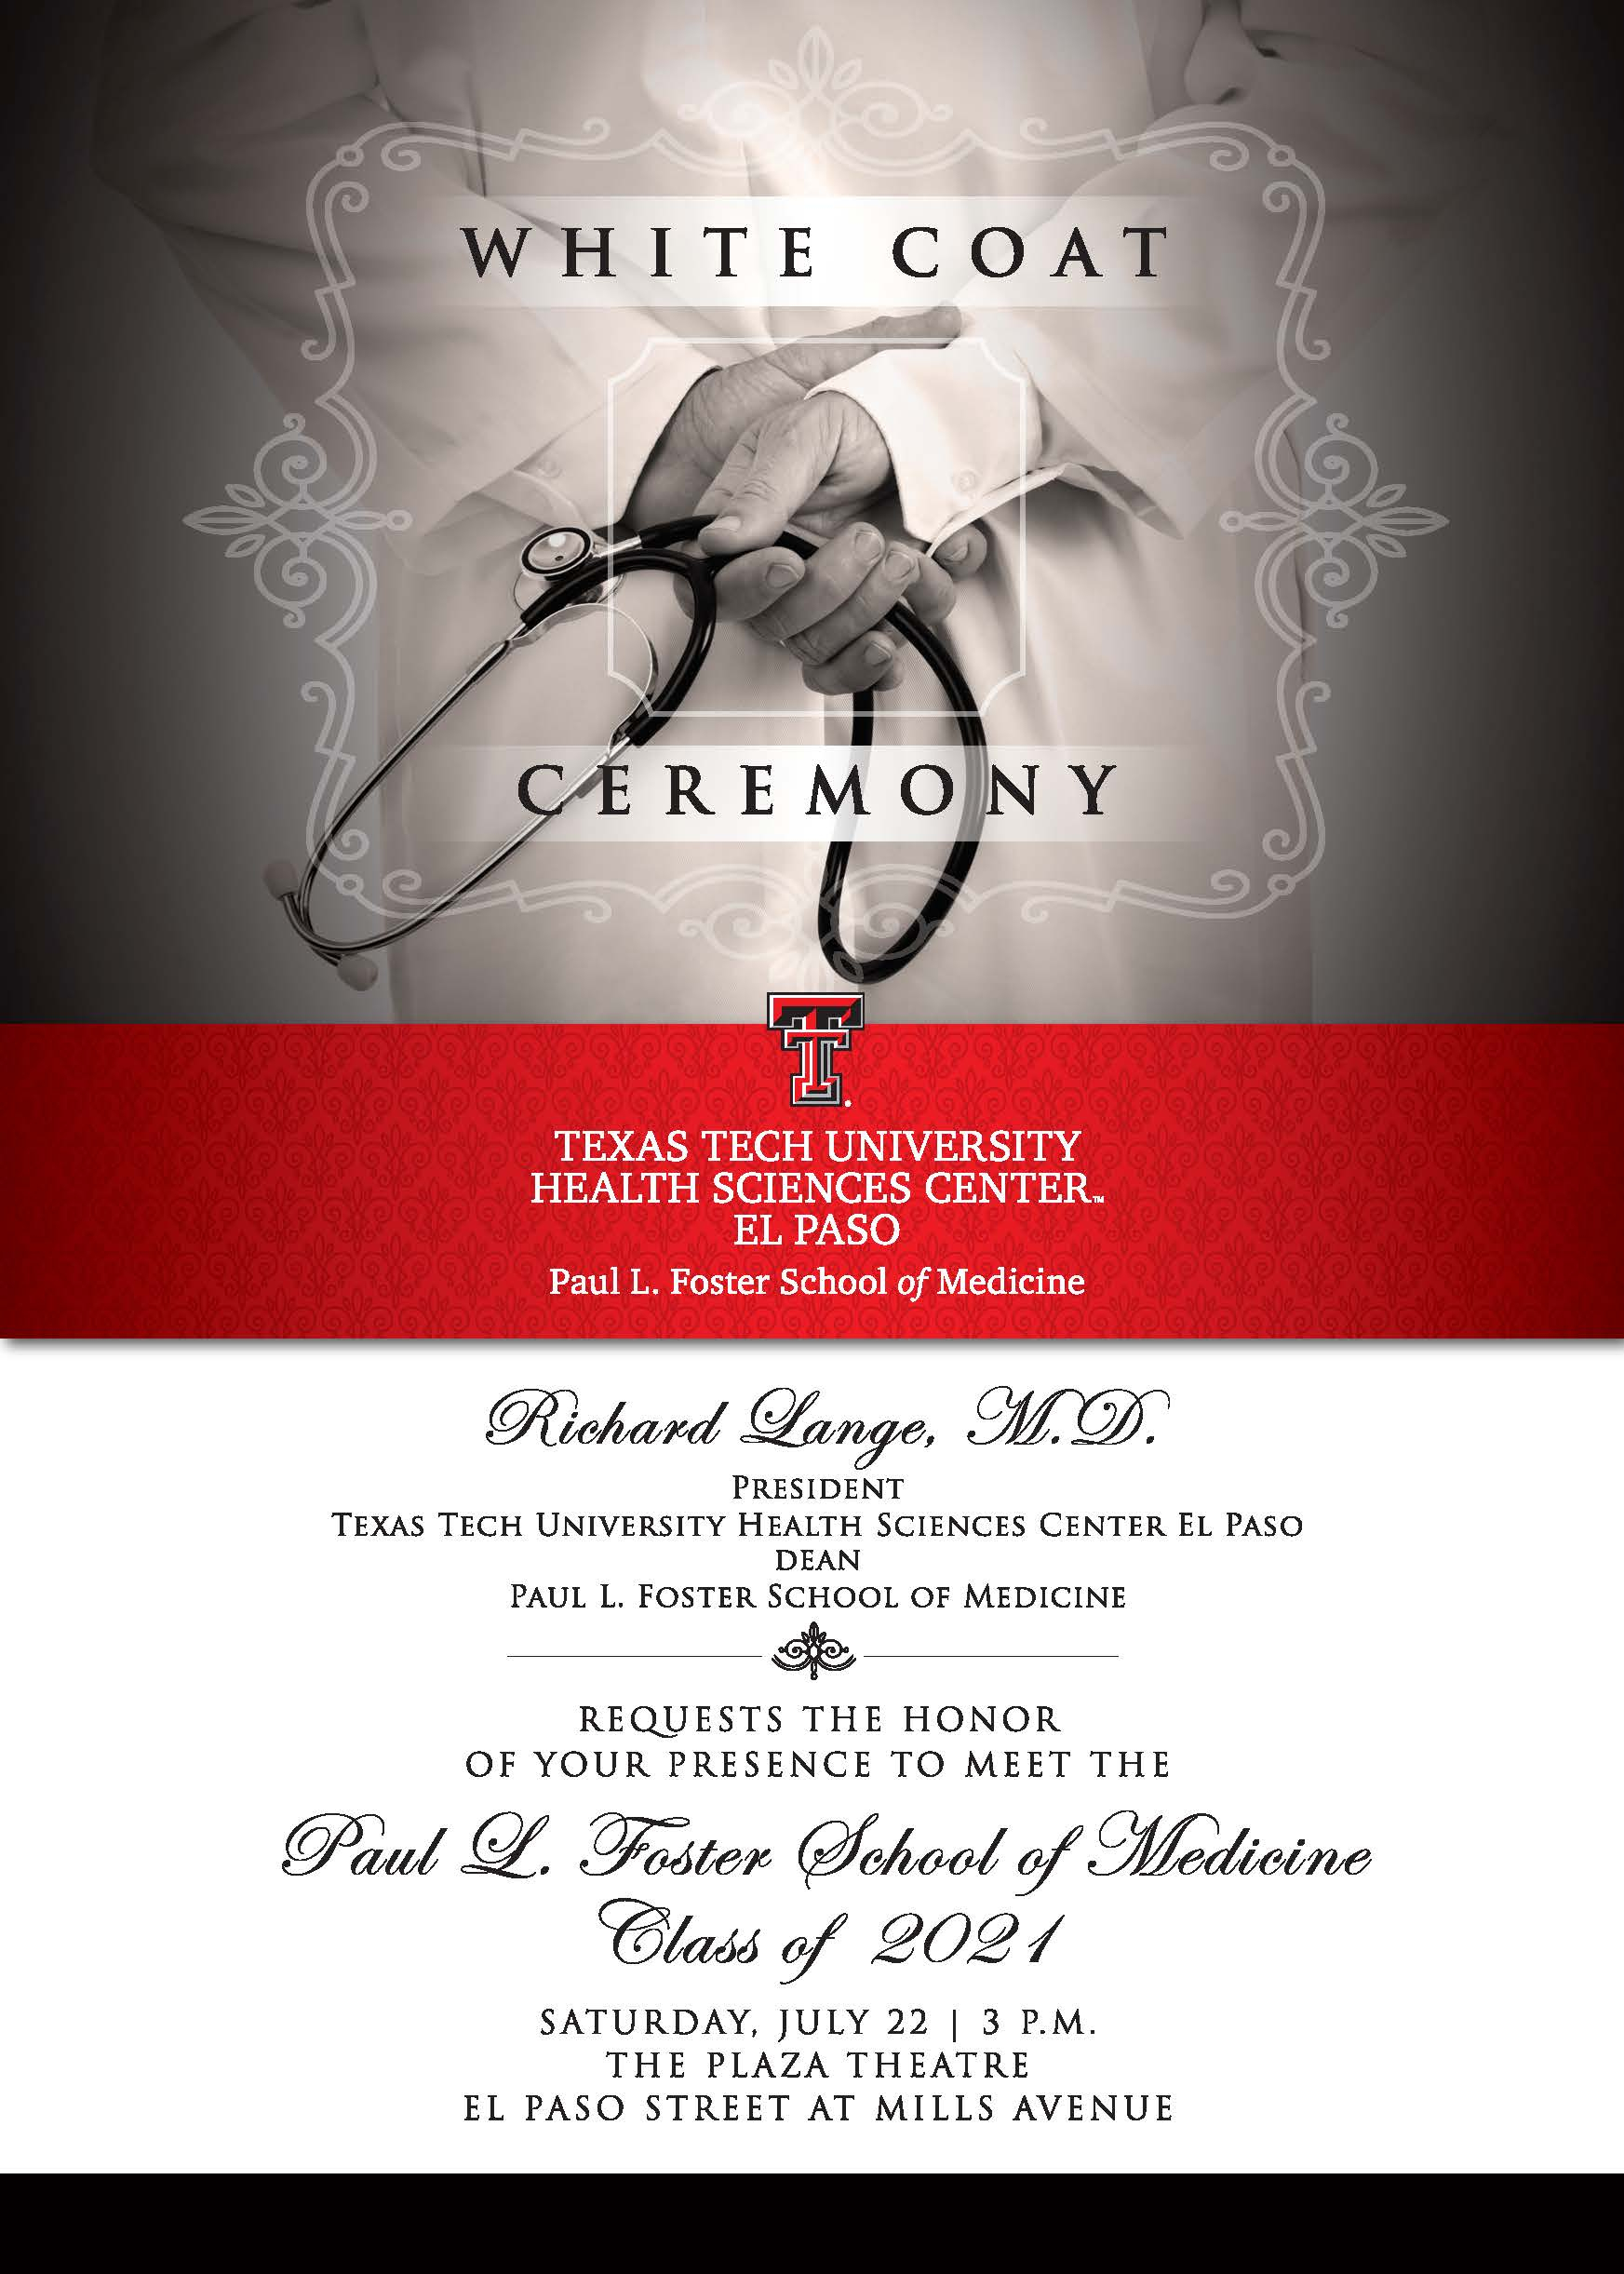 White Coat Ceremony - July 22 regarding Texas Tech Calendar For 2021 -2020 Academic